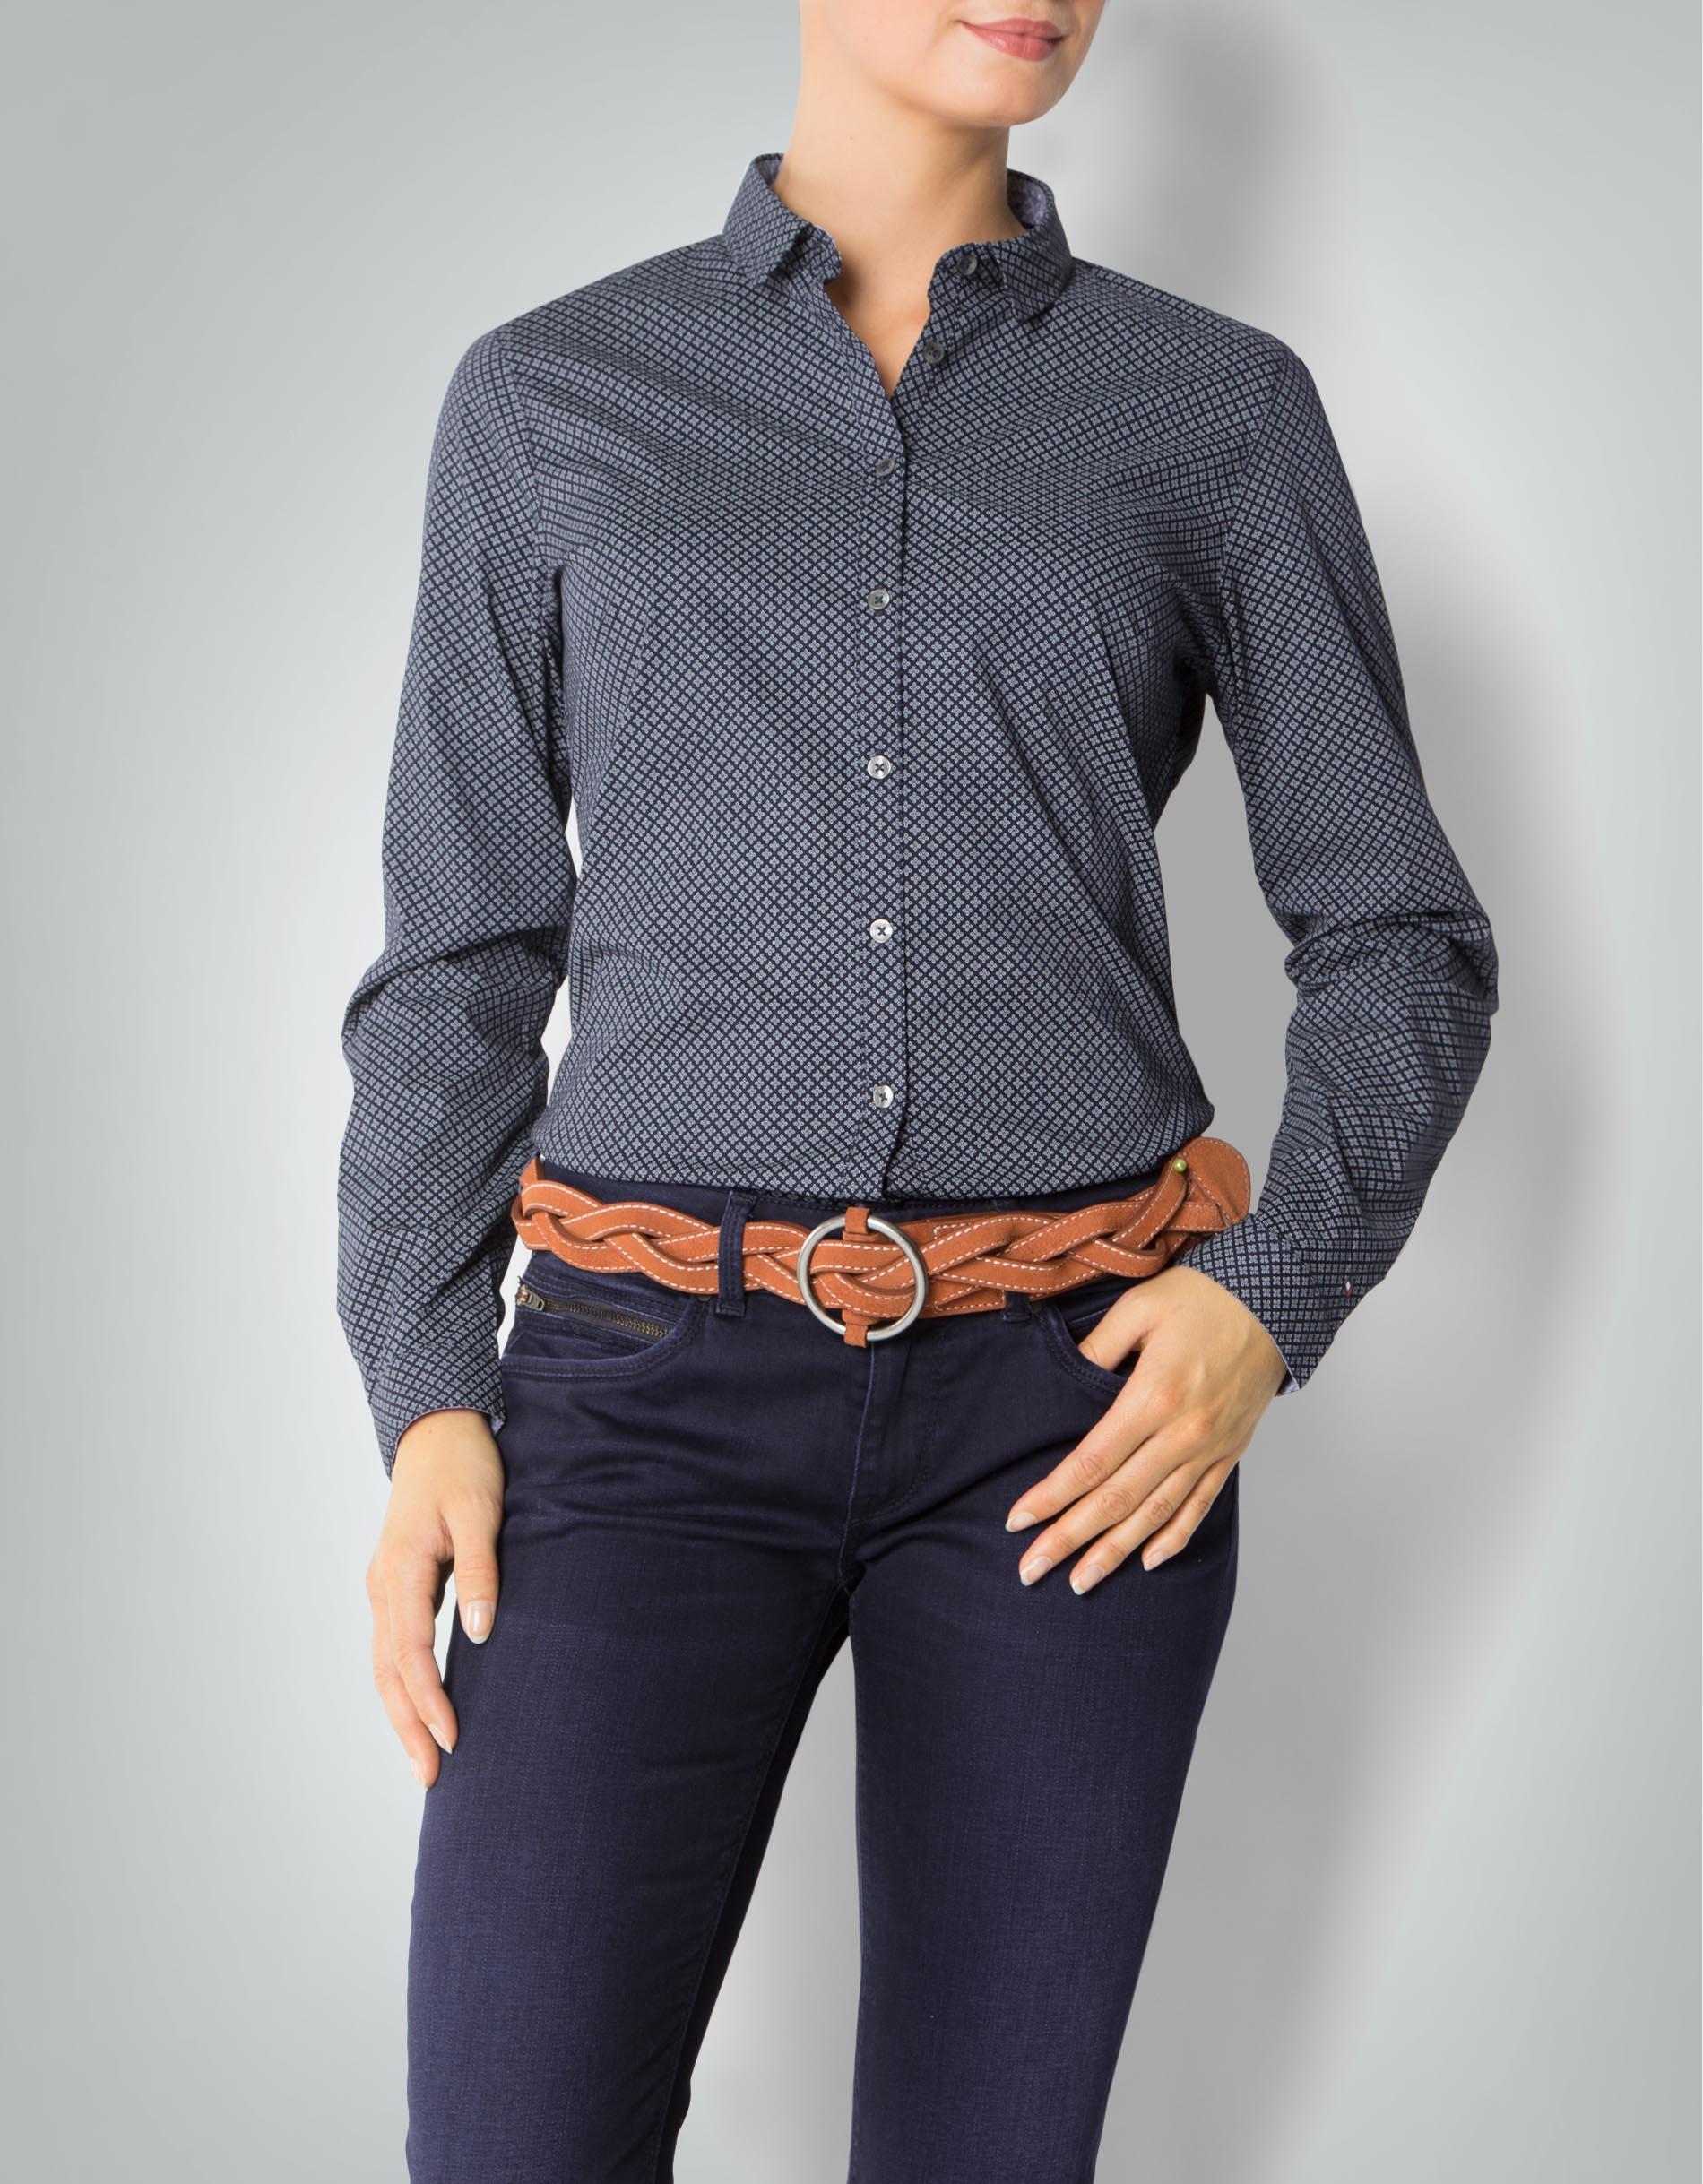 tommy hilfiger damen bluse hemd aus baumwolle empfohlen. Black Bedroom Furniture Sets. Home Design Ideas